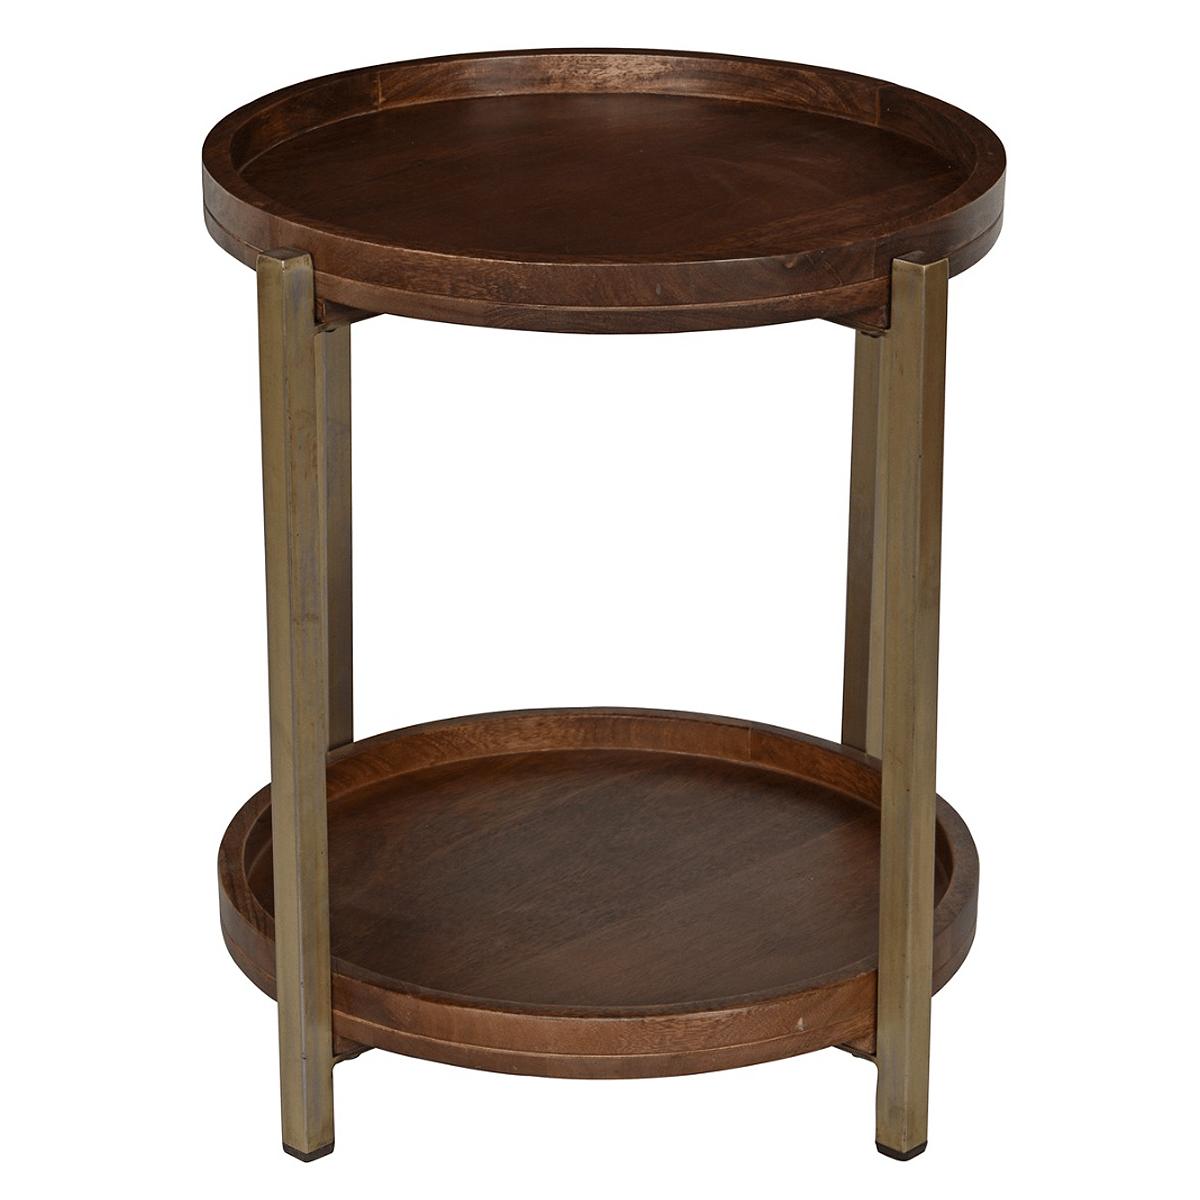 baxter-side-table-2-shopceladon